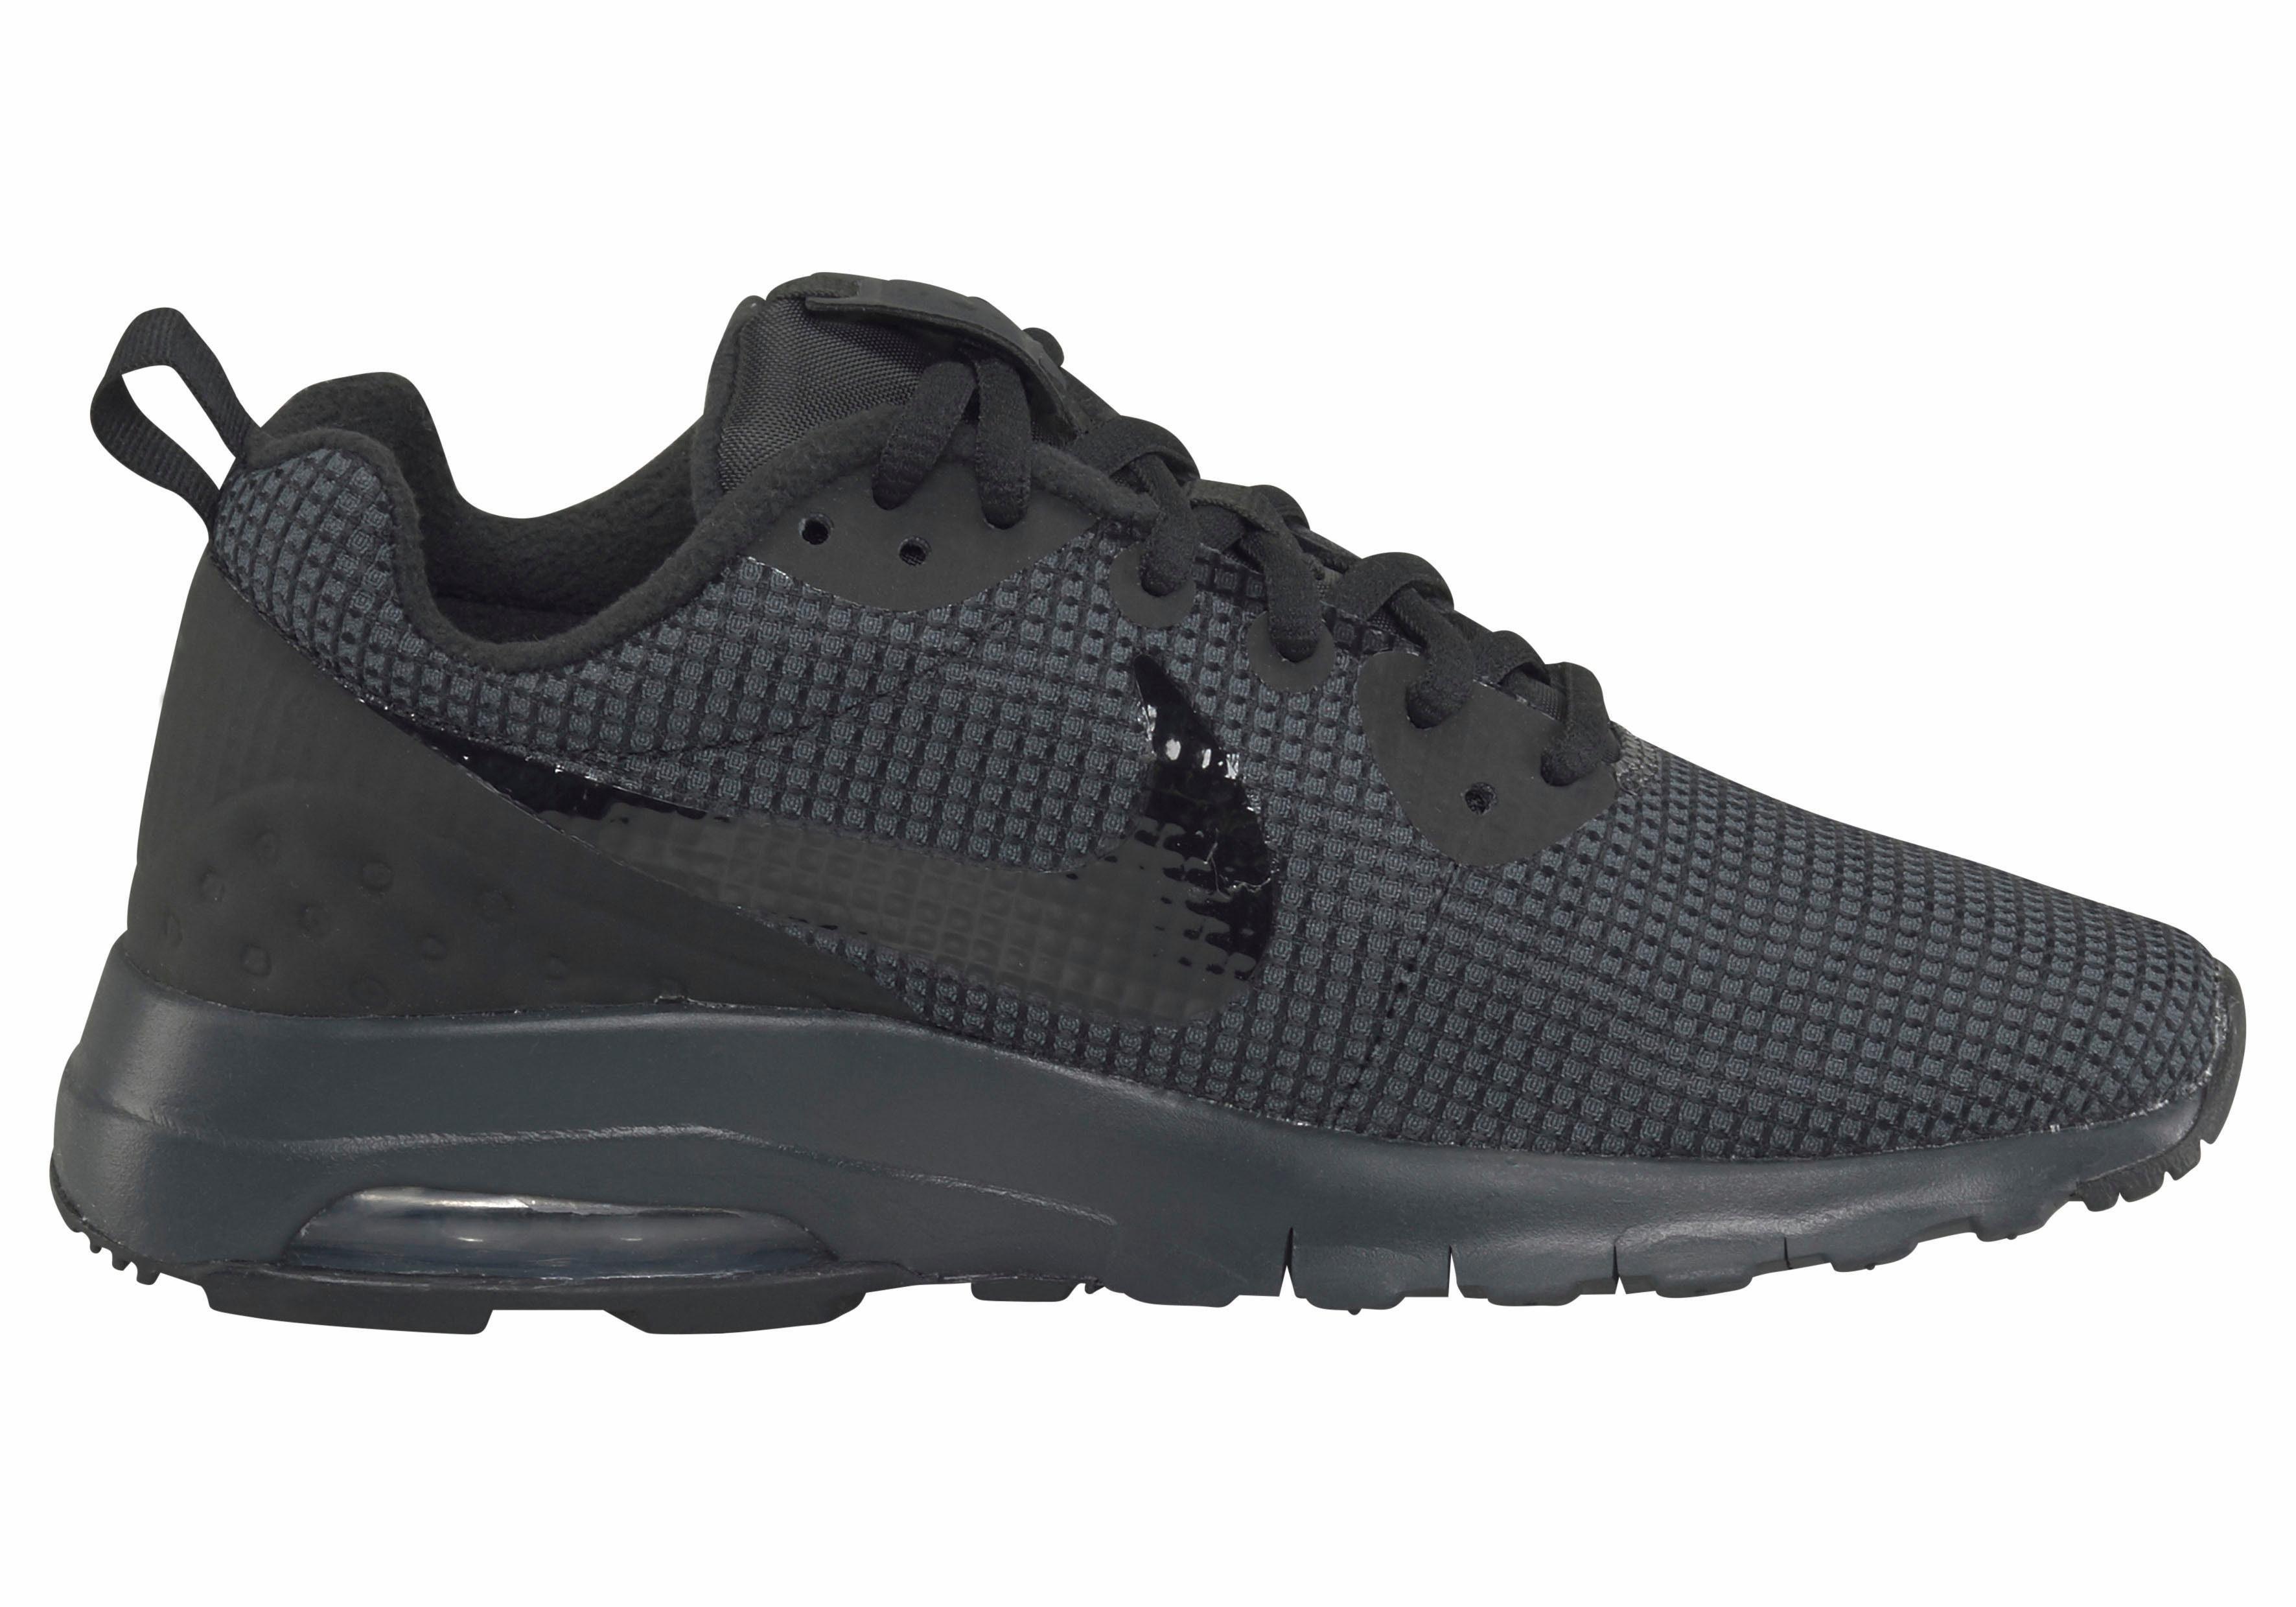 Nike Sportswear Wmns Air Max Motion LW SE Sneaker online kaufen  schwarz-schwarz